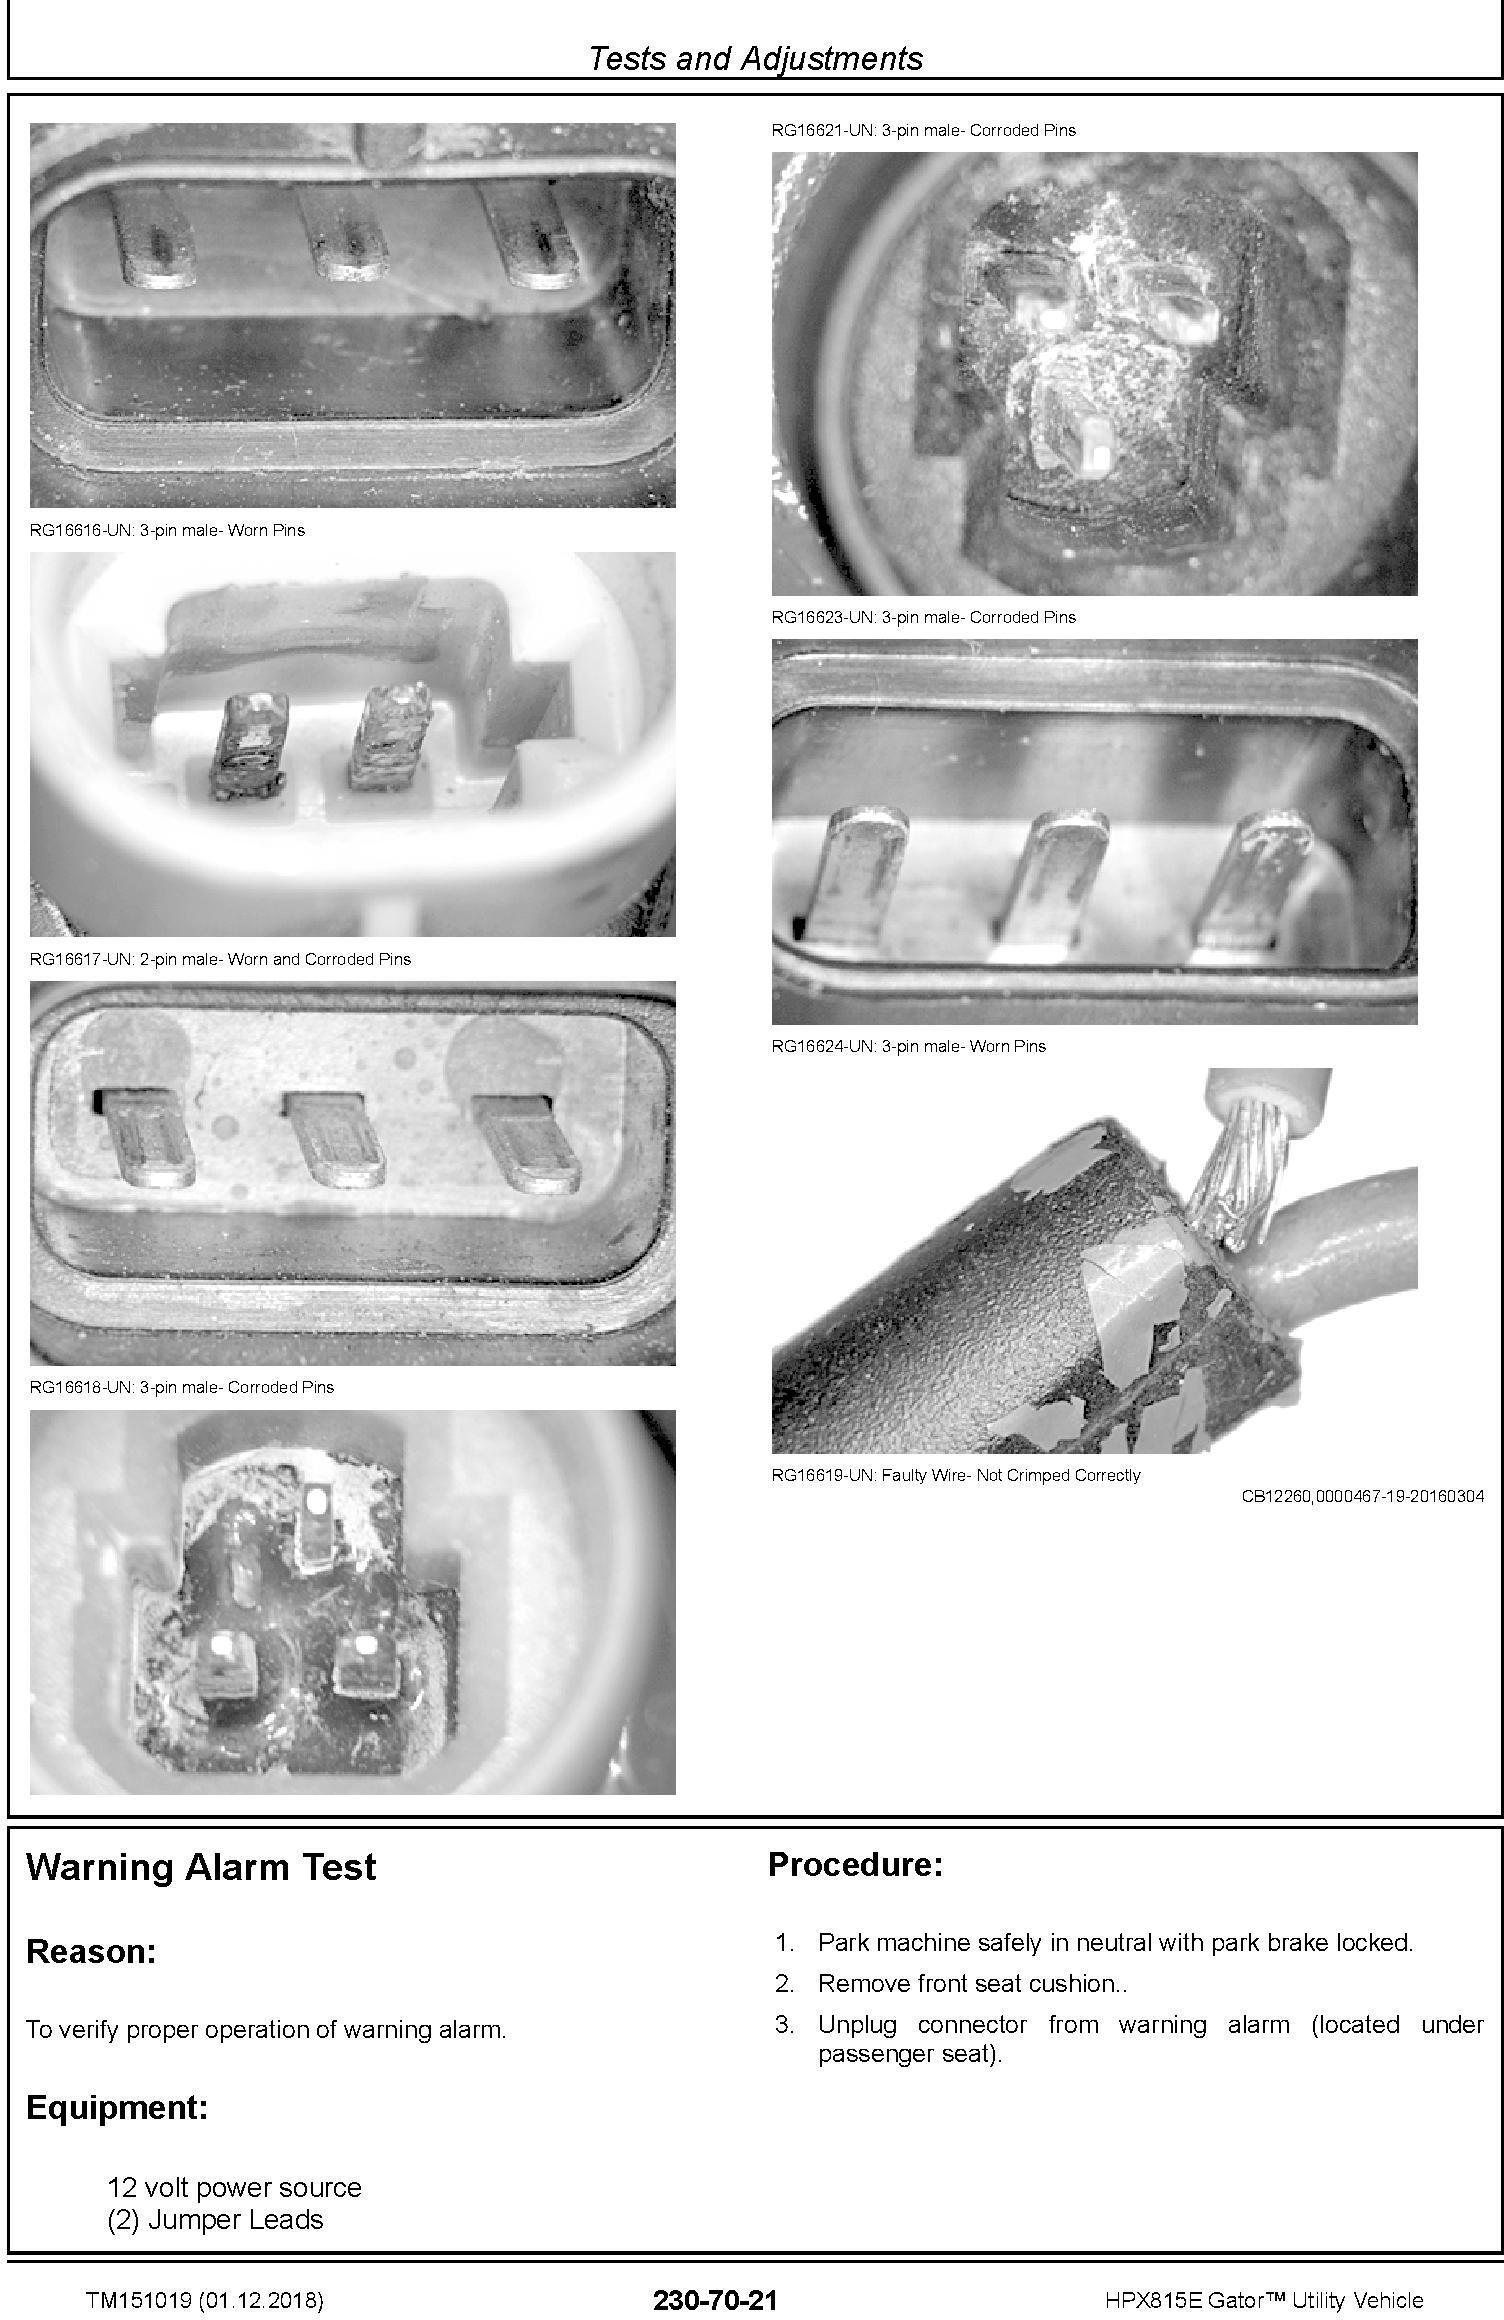 John Deere HPX815E Gator Utility Vehicle (SN. 010001-) Technical Service Manual (TM151019) - 3